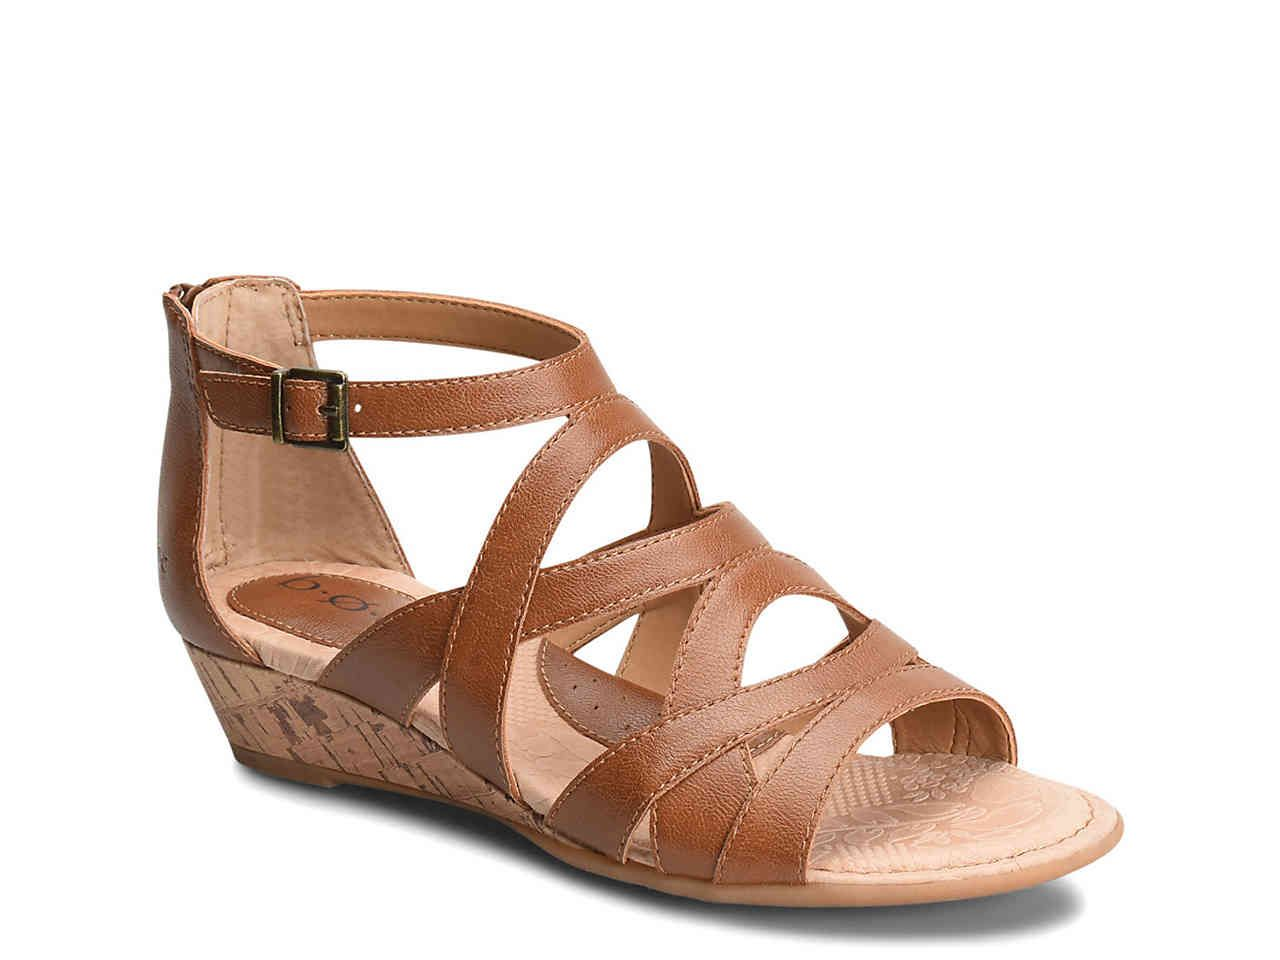 b.o.c Searing Wedge Sandal DSW $50